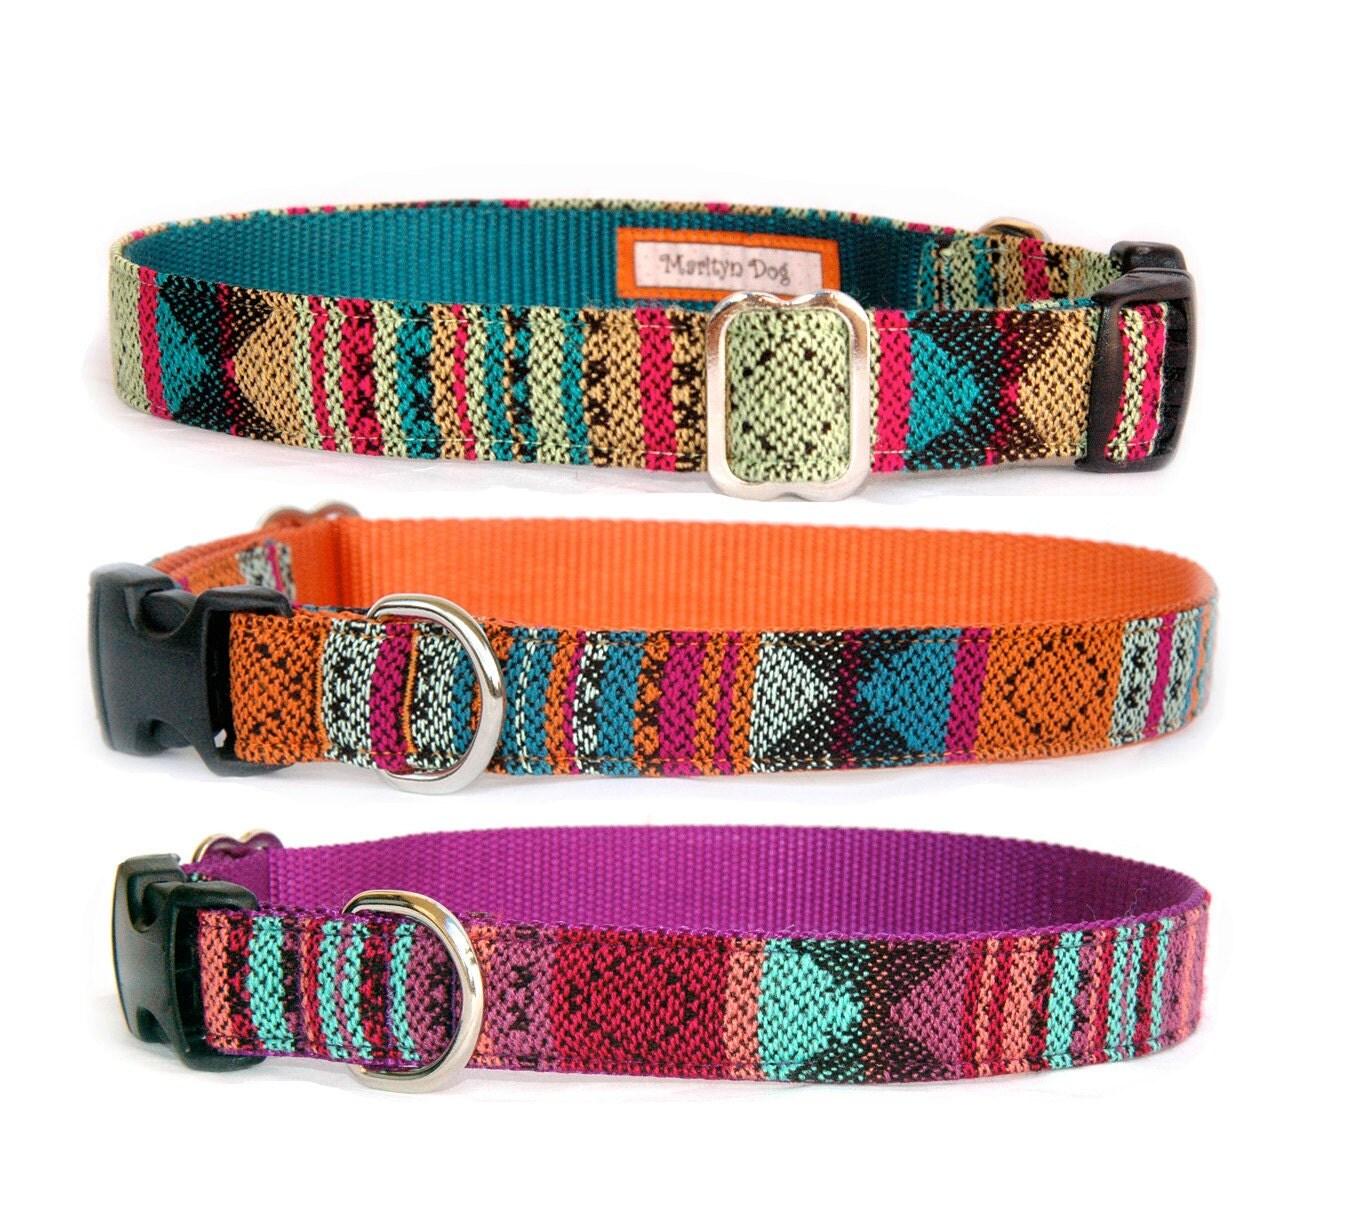 Aztec Dog Collar And Leash